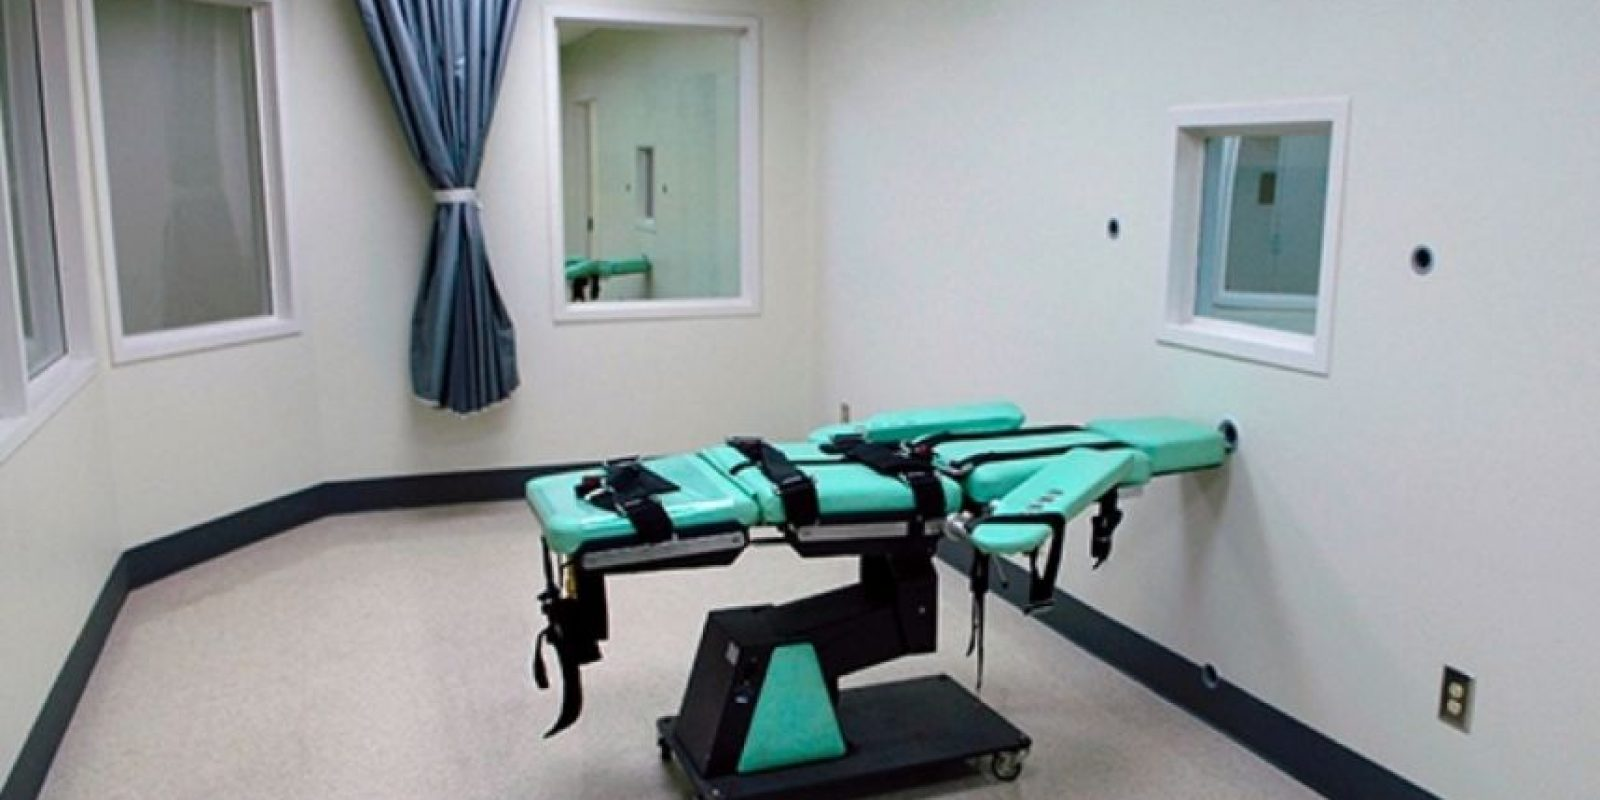 Países que siguen aplicando la pena de muerte Foto:Wikipedia.org